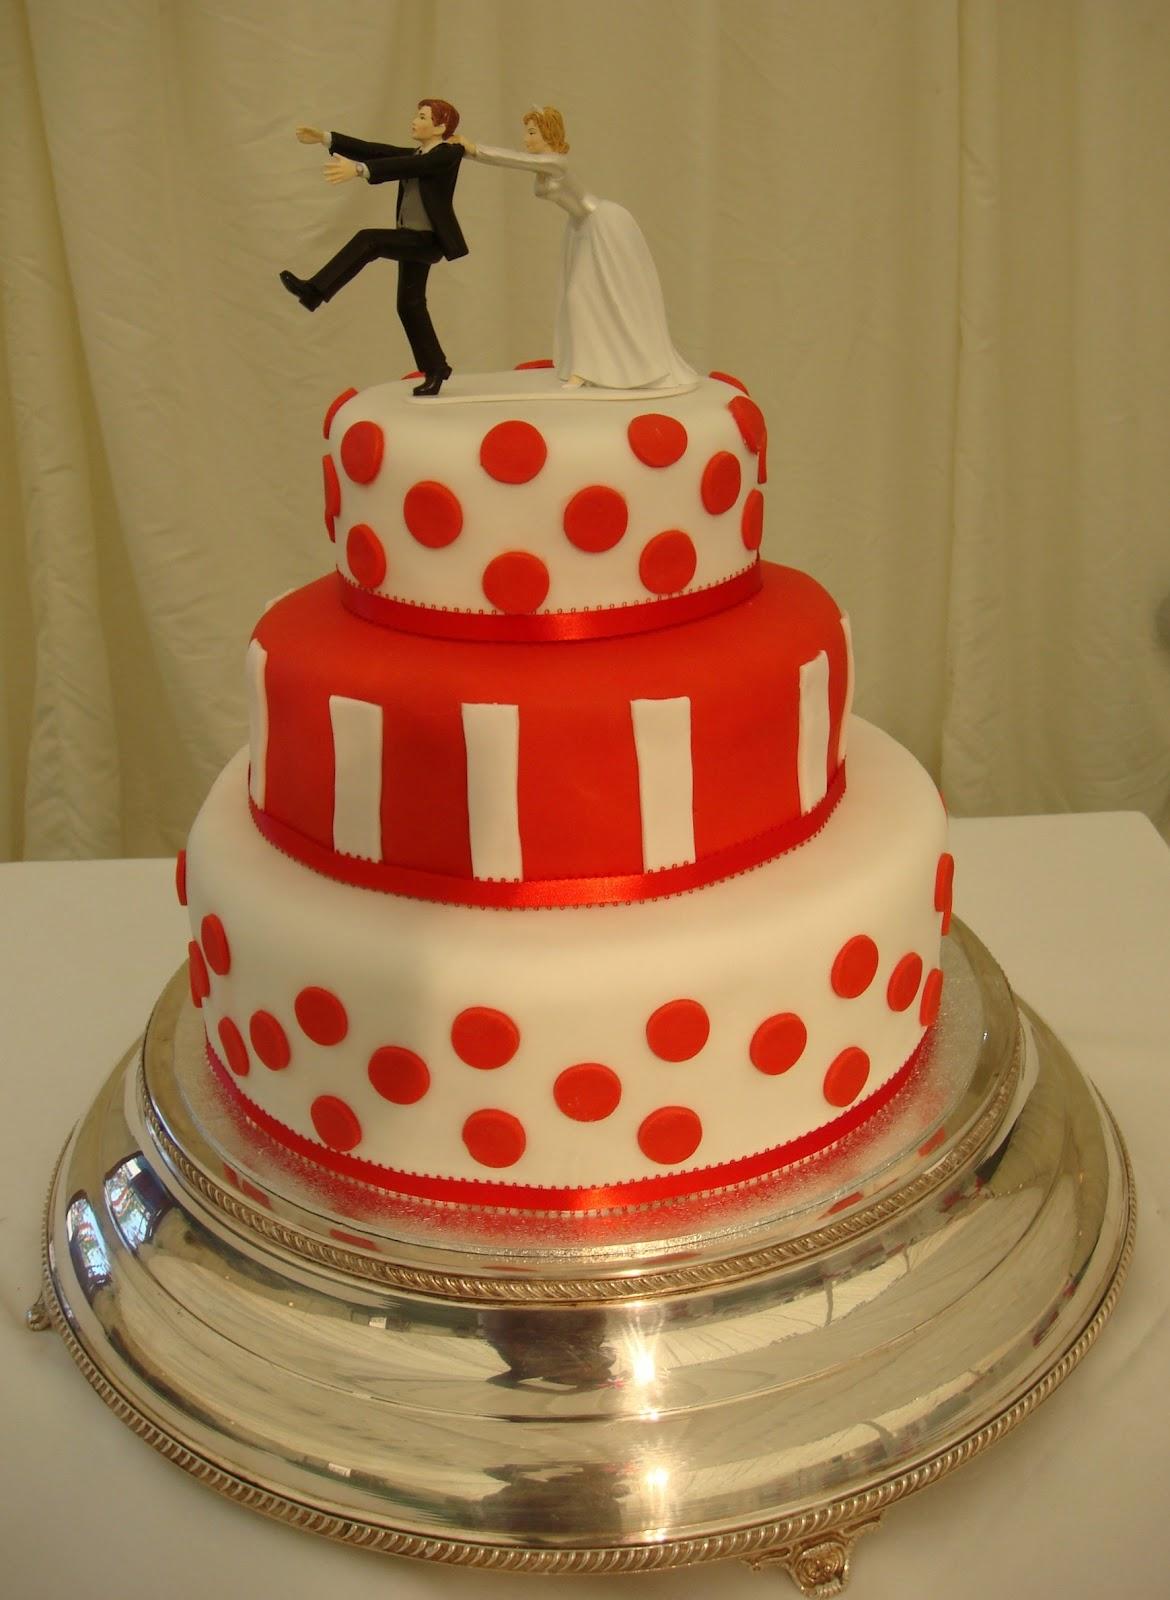 FEISTY TAPAS Red and white wedding cake